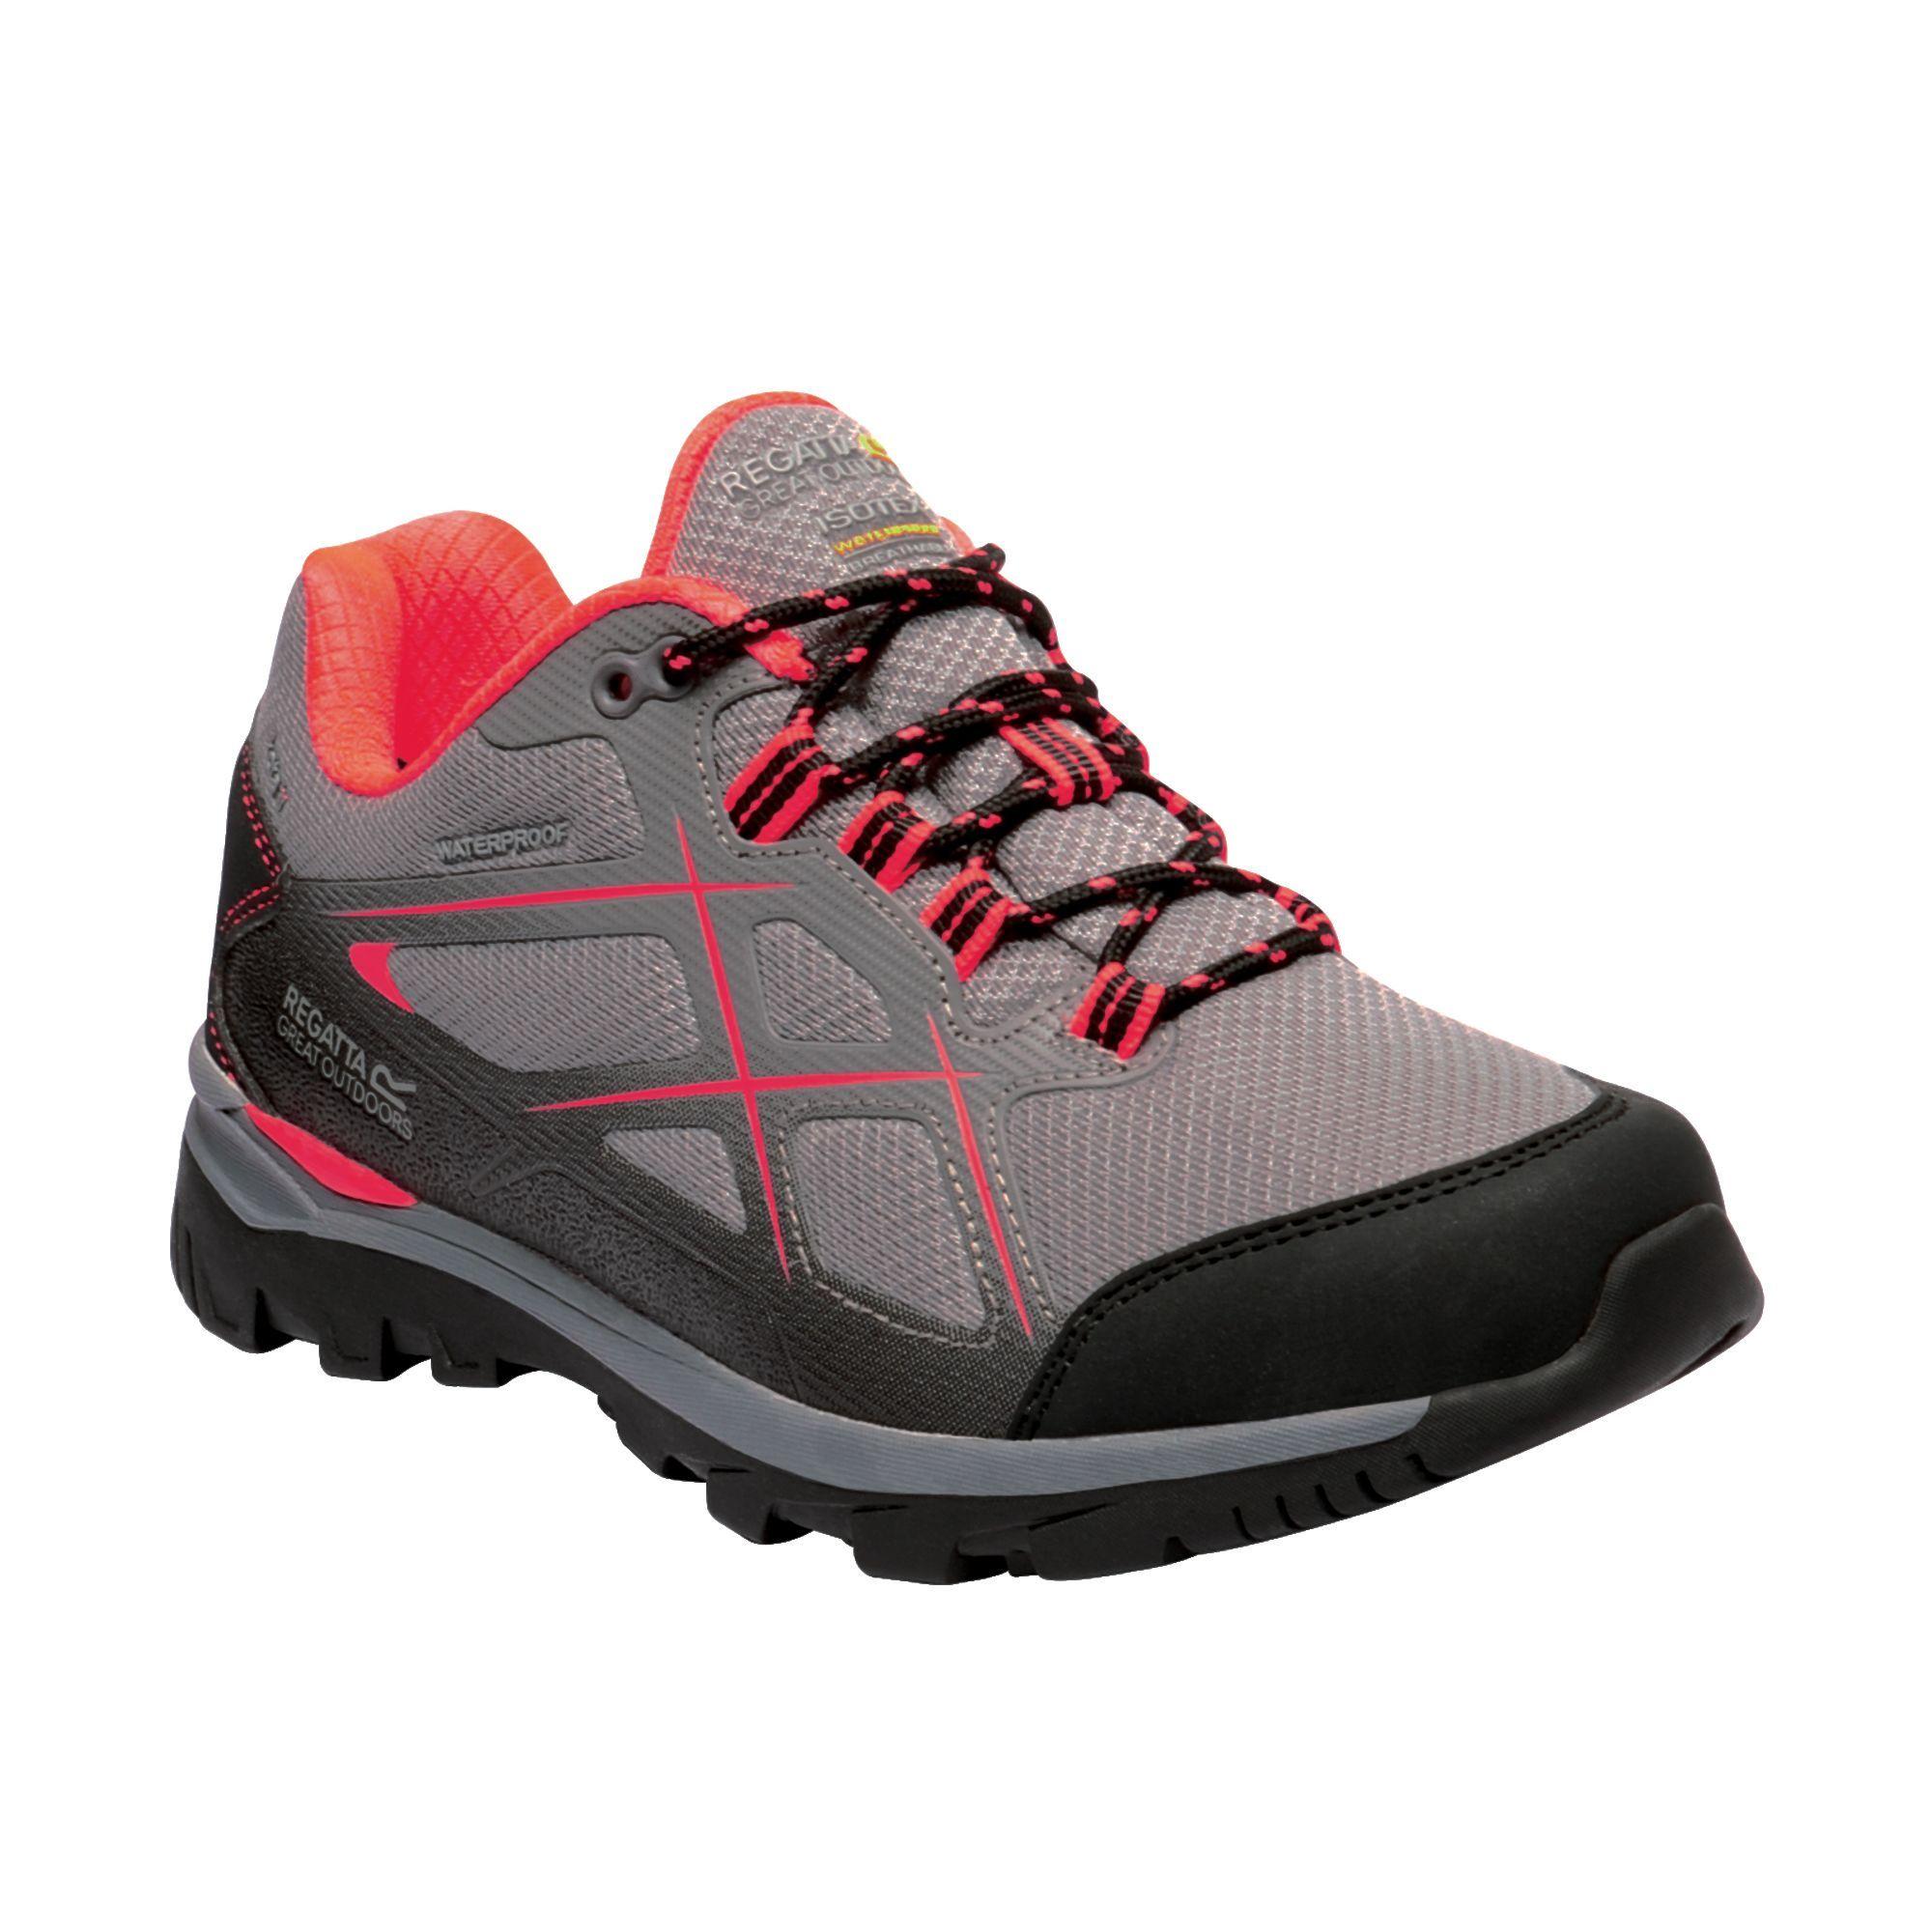 Regatta Great Outdoors Womens/Ladies Kota II Waterproof Walking Shoes